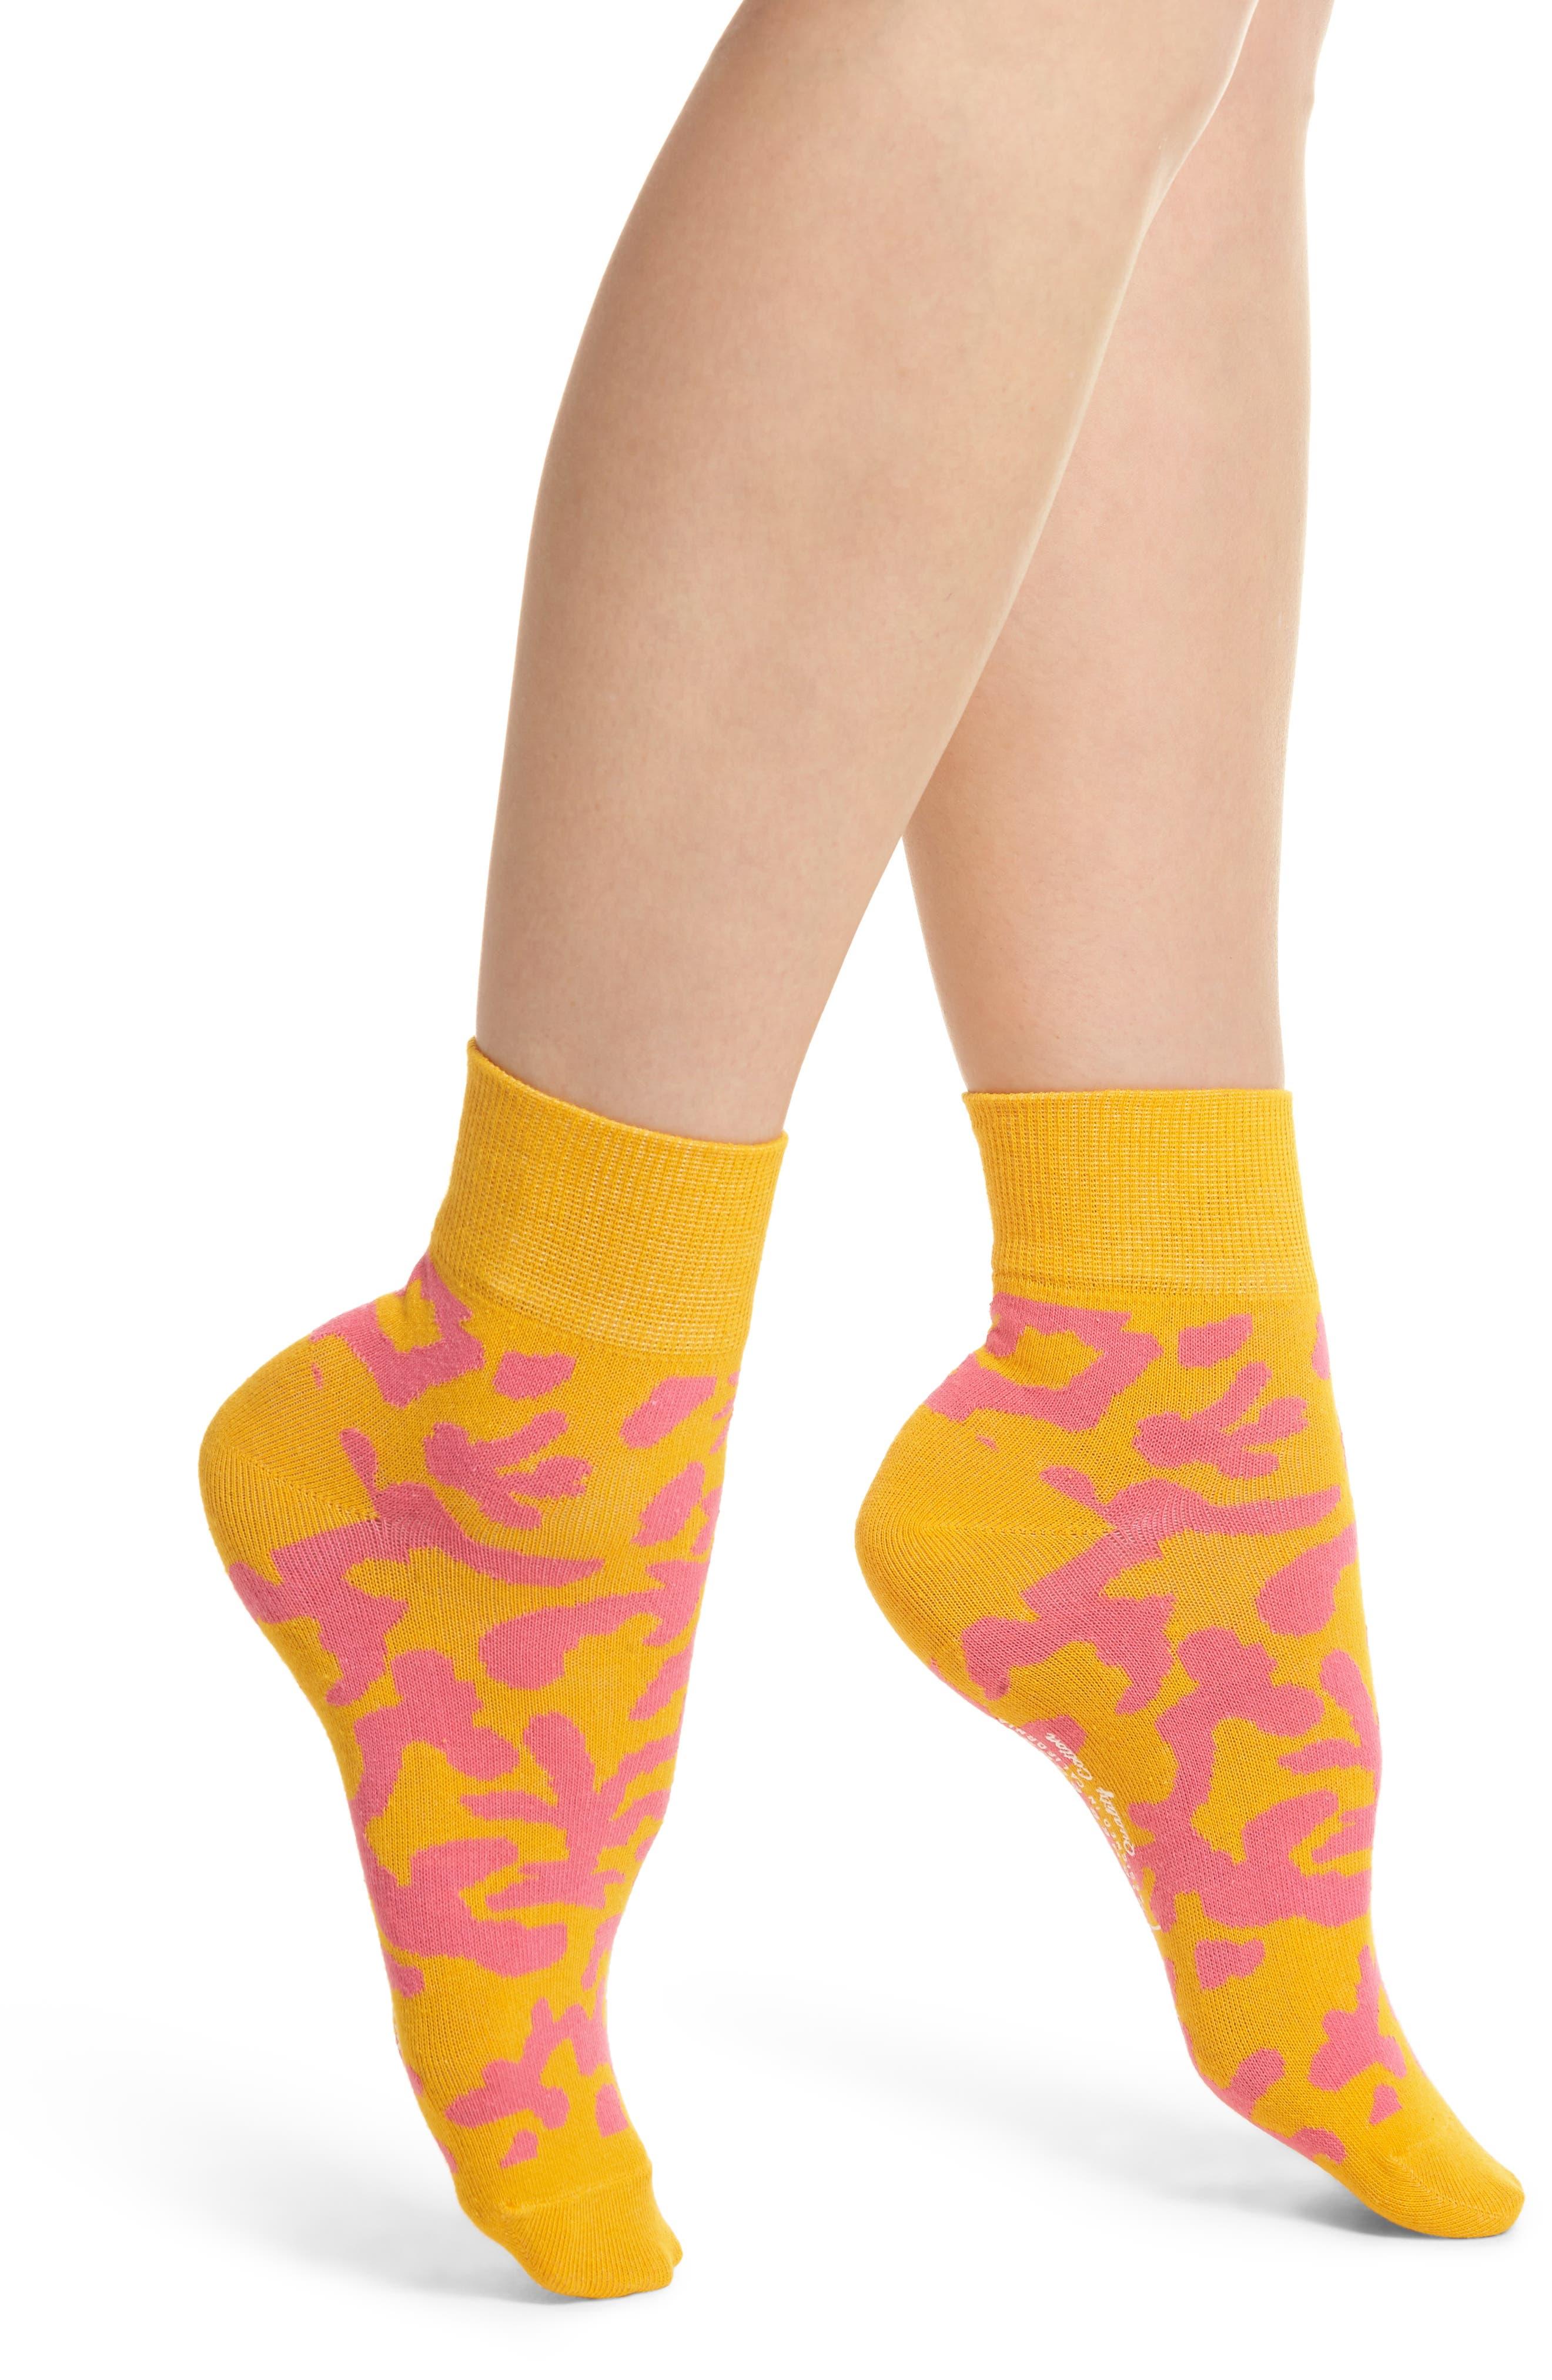 Coral Will Bryant Crew Socks,                             Main thumbnail 1, color,                             820